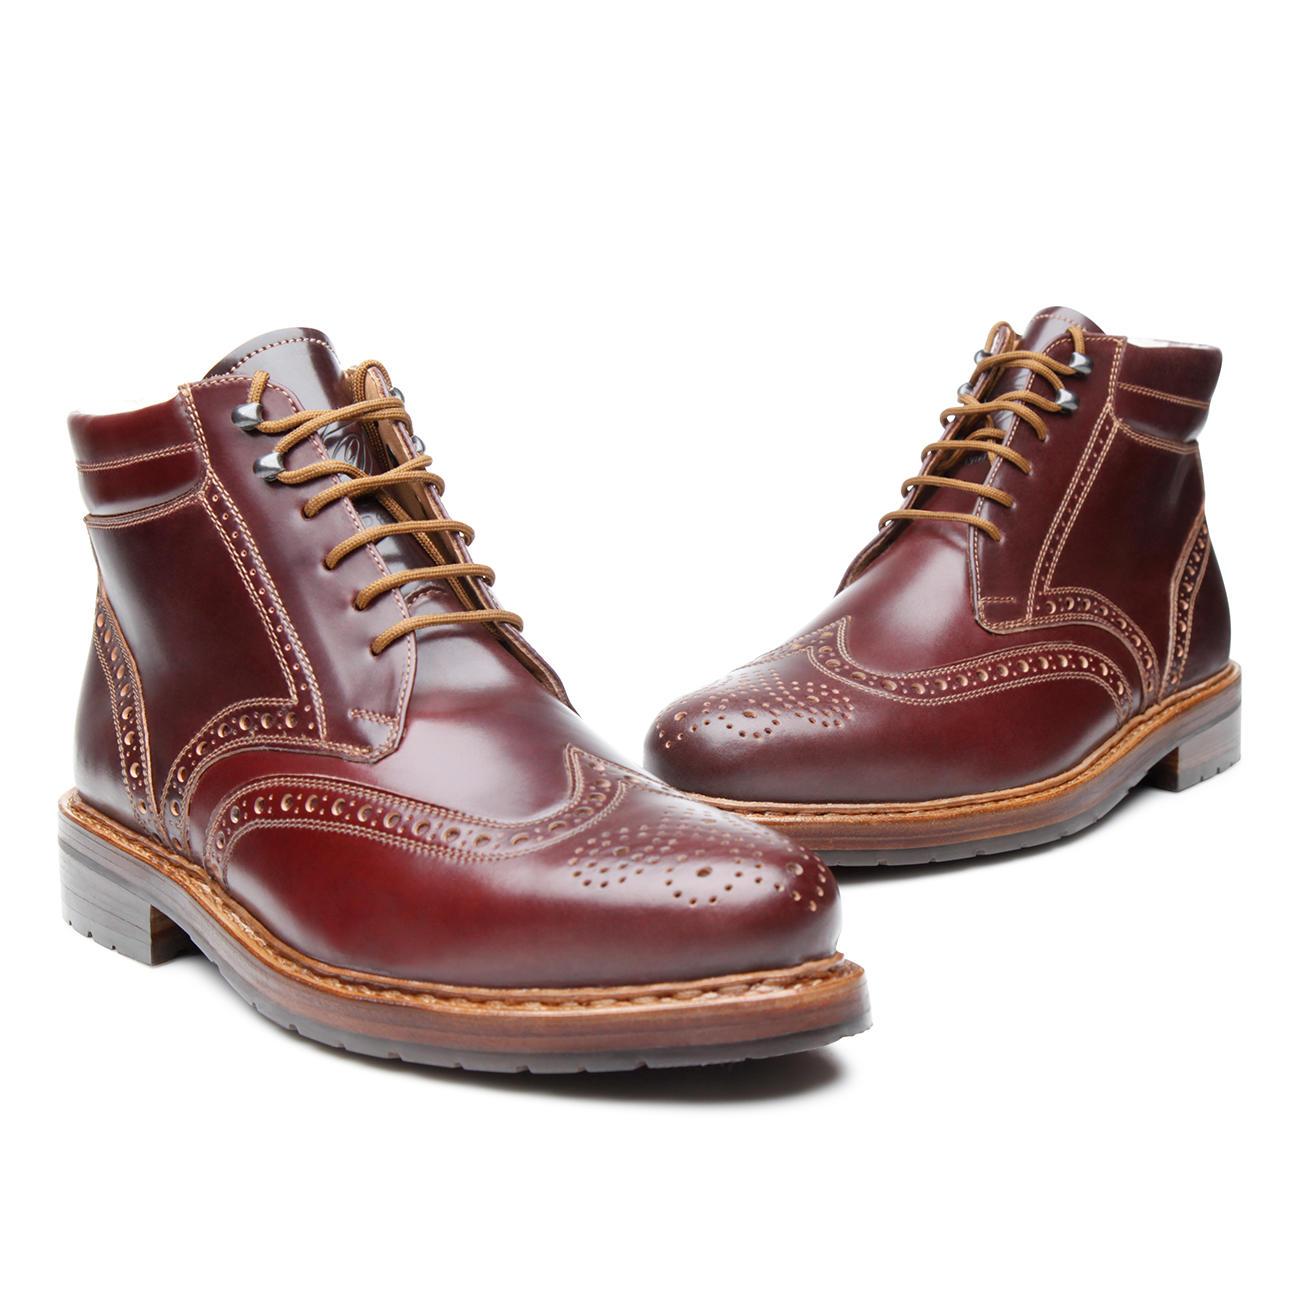 free shipping 613c5 21e97 Dinkelacker Budapester-Boots | Klassiker entdecken